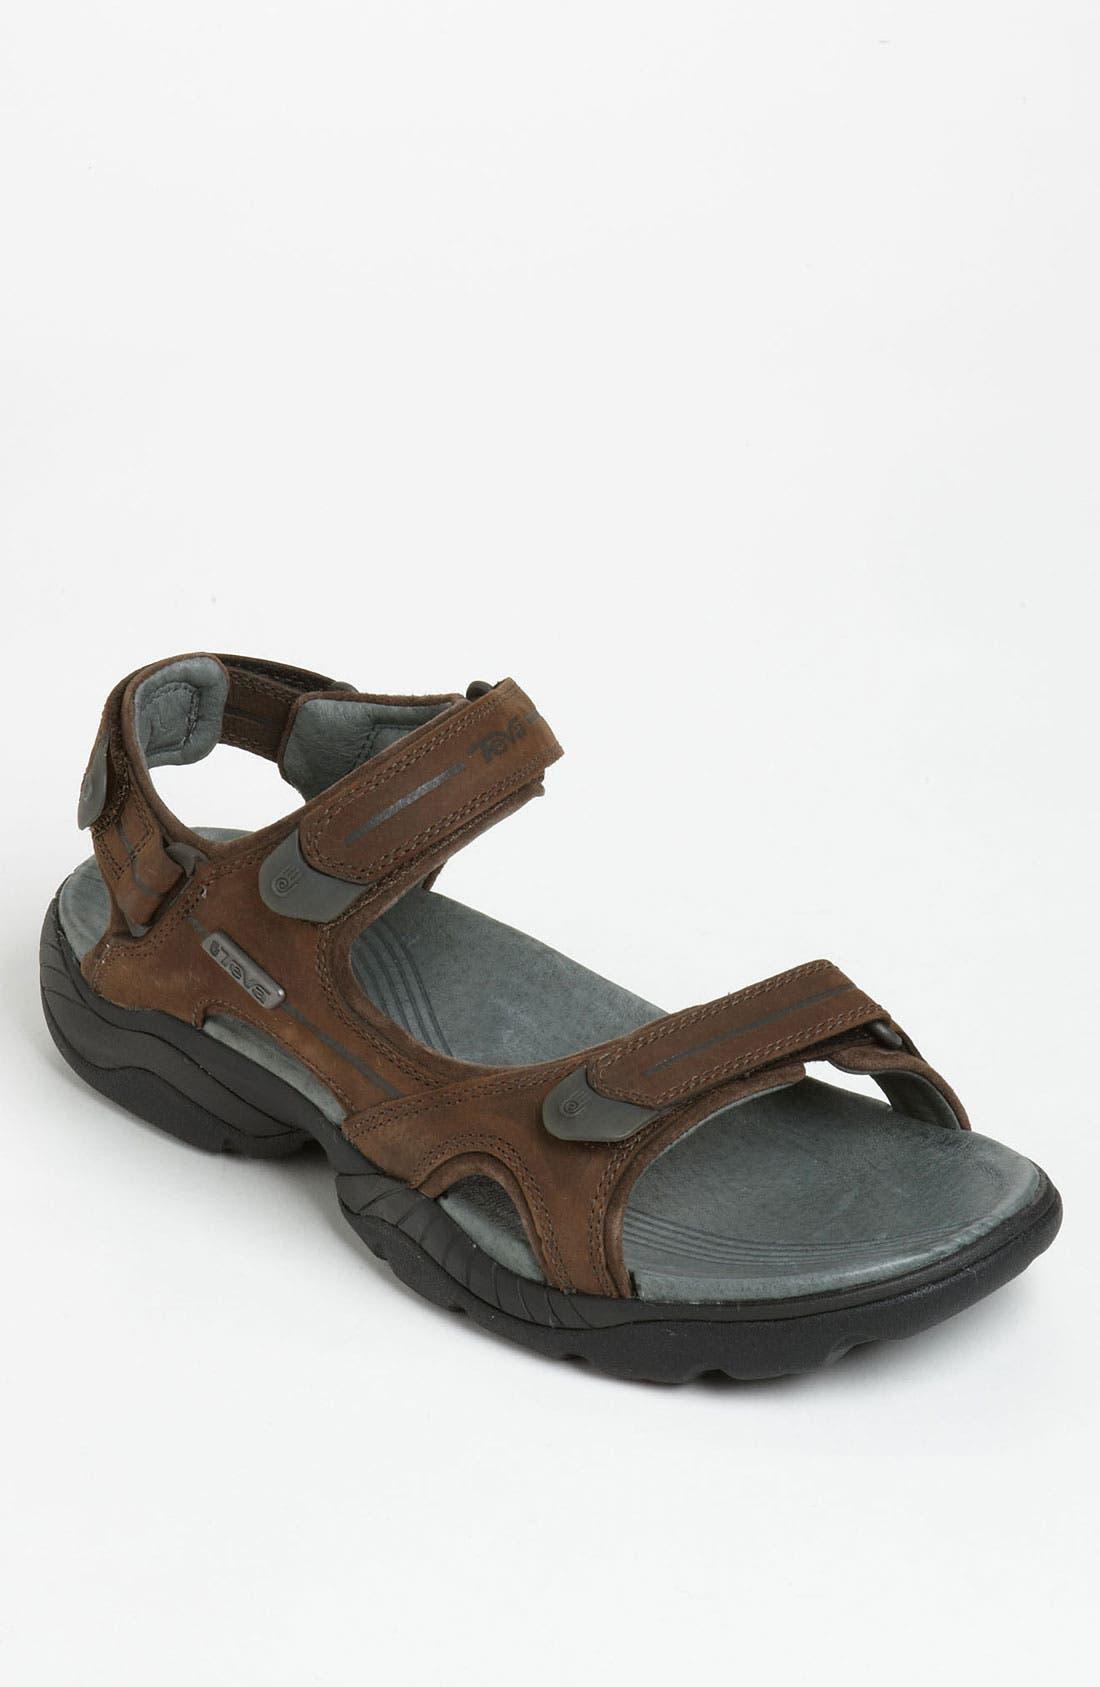 Alternate Image 1 Selected - Teva 'Obern' Sandal